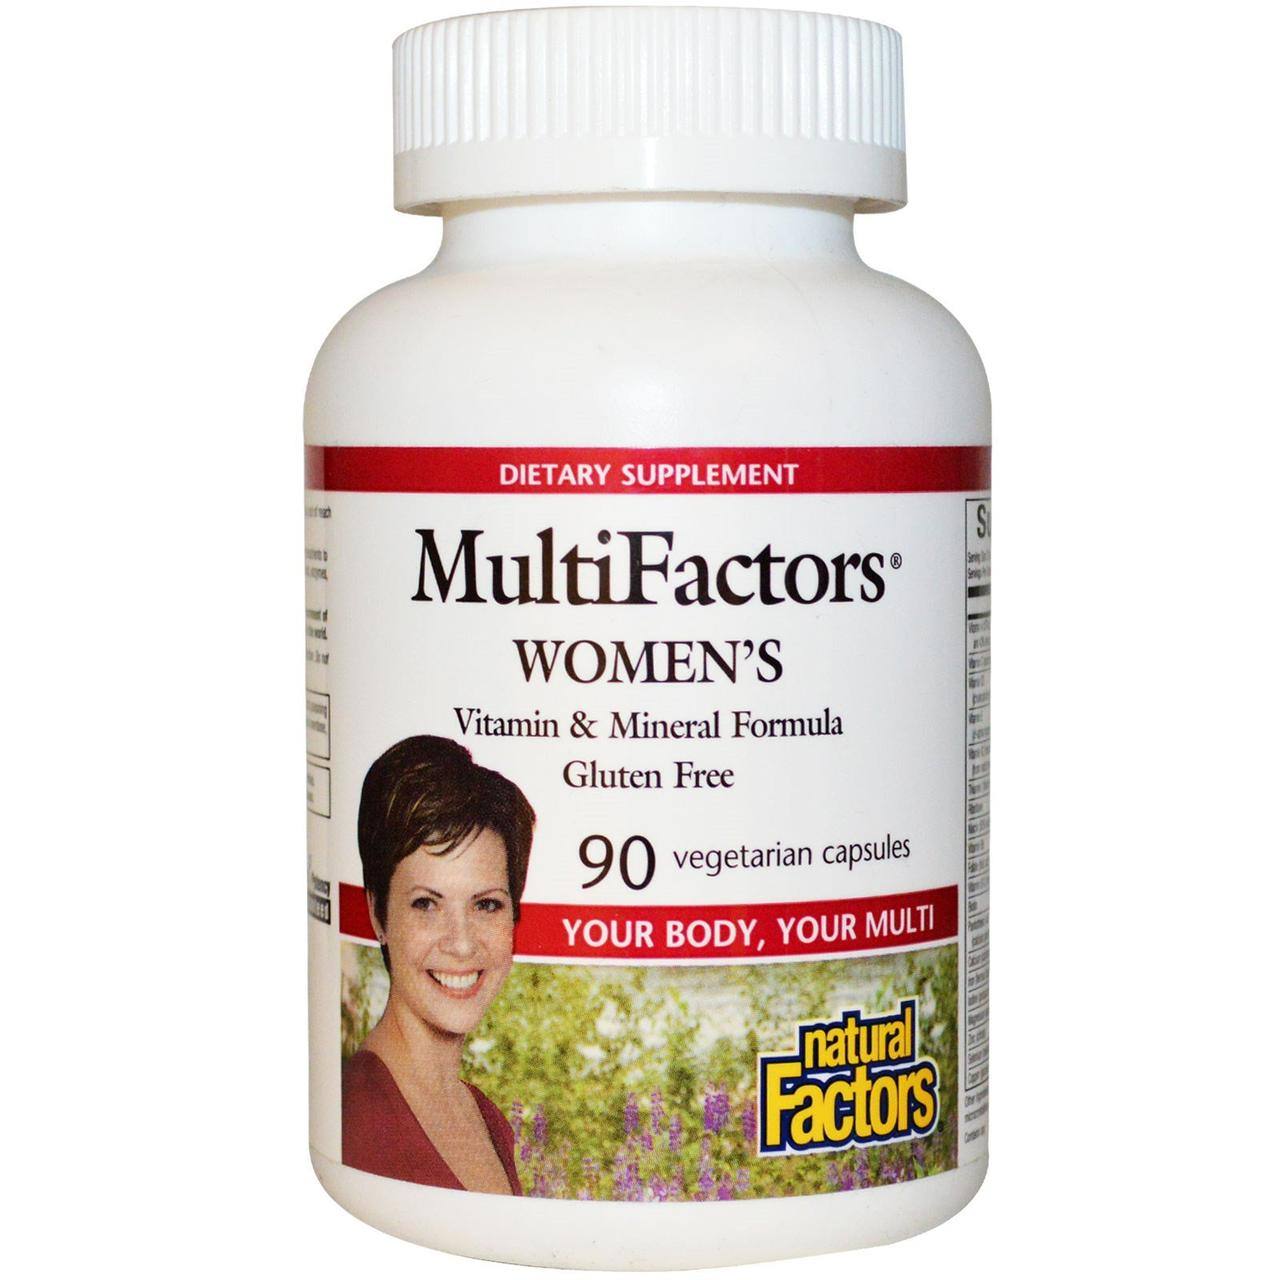 Natural Factors, MultiFactors, Women's Vitamin & Mineral Formula, Gluten Free, 90 Veggie Caps